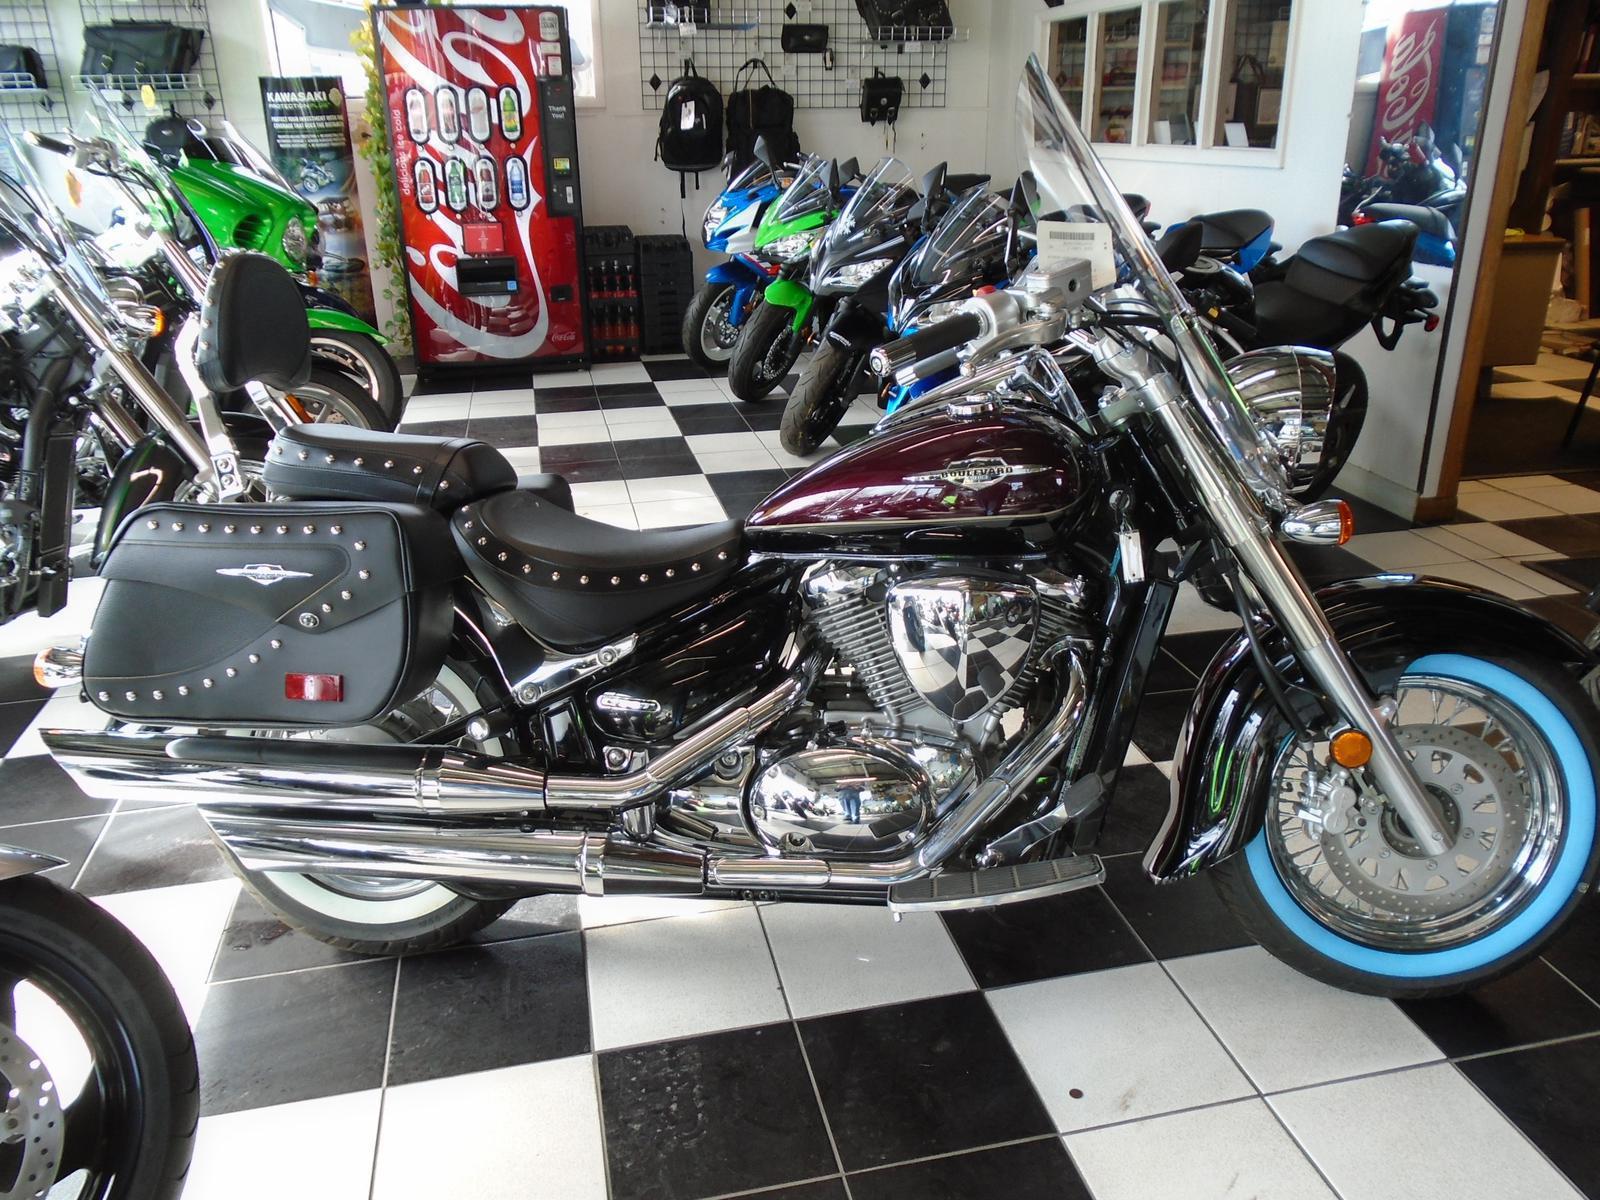 2015 Suzuki Boulevard C50T for sale in Bridgeport, WV